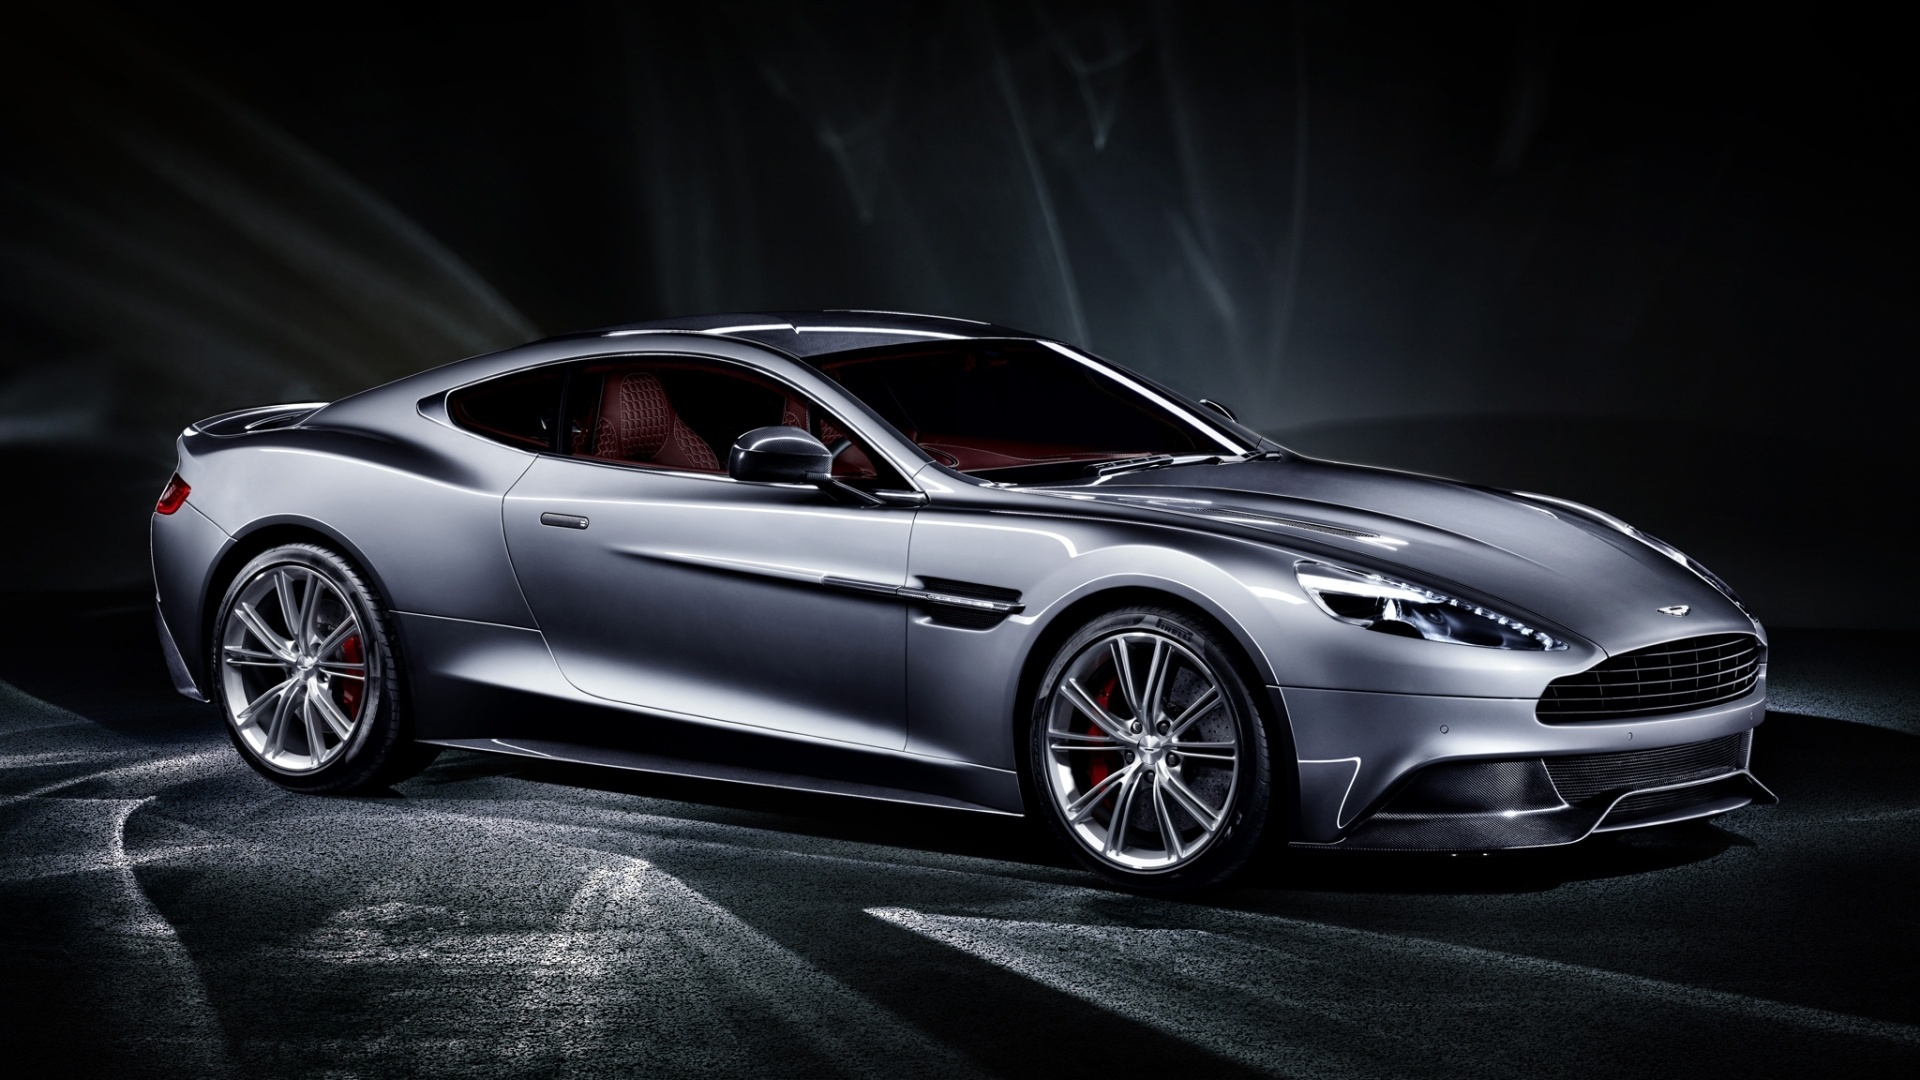 Fondos De Pantalla 2013 Aston Martin Vanquish Coche Plateado